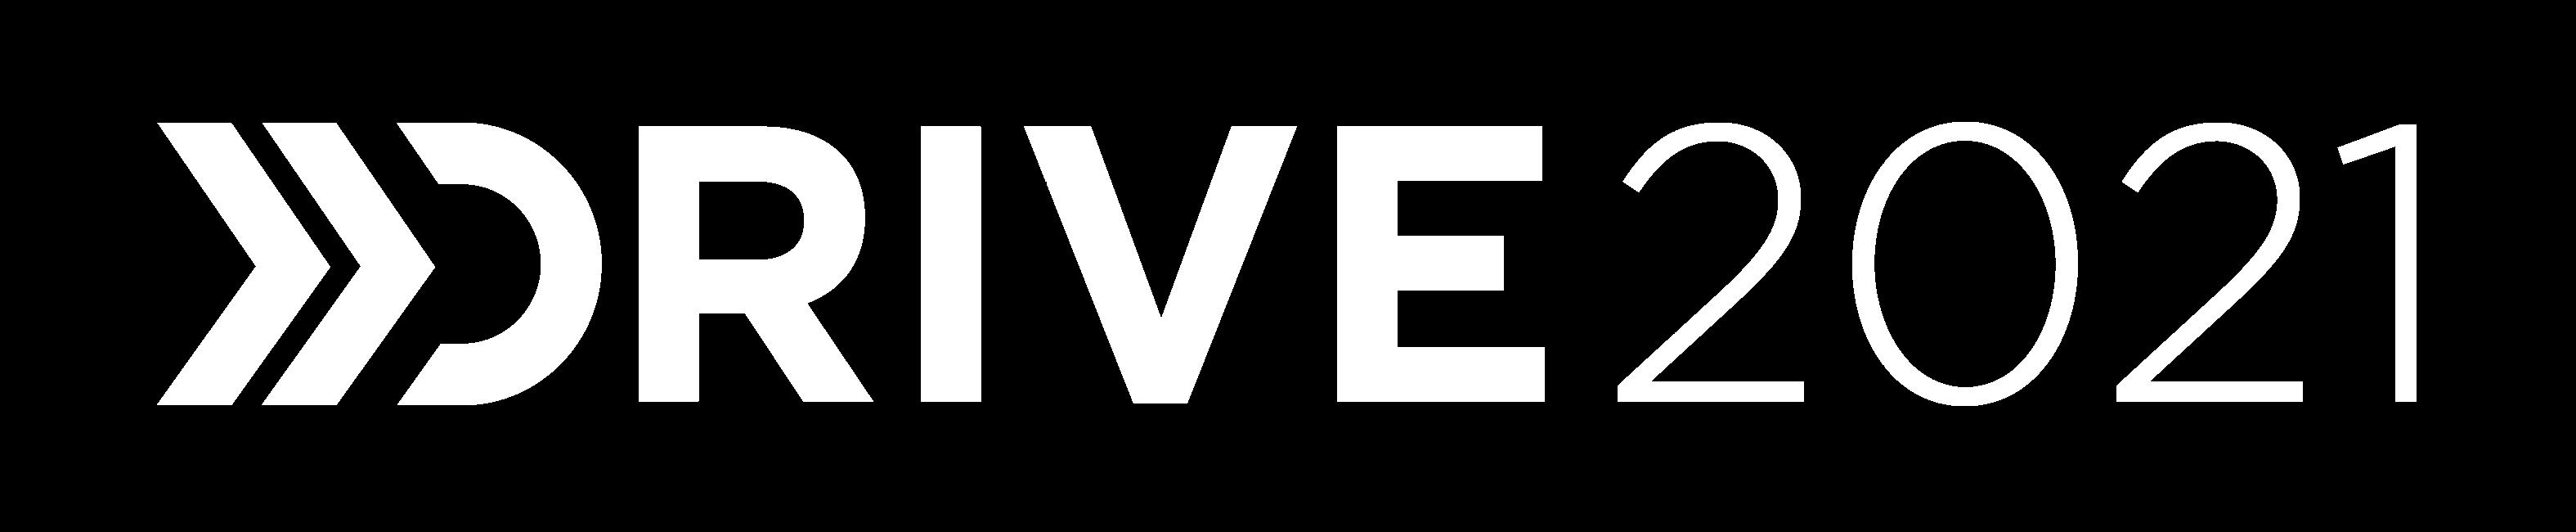 DRIVE 2021 Industry Summit logo